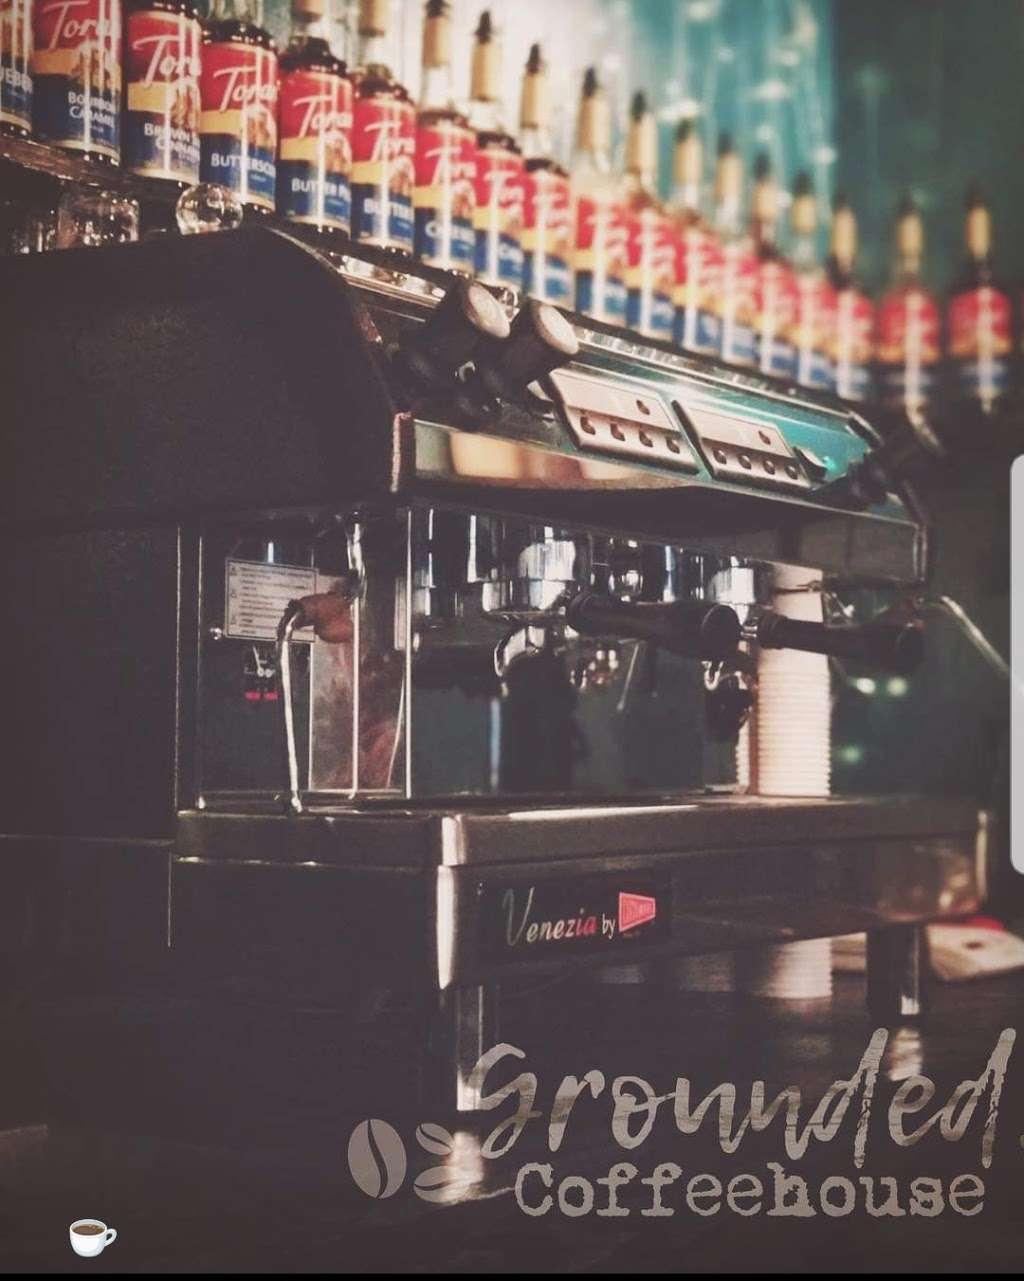 Grounded Coffeehouse - cafe  | Photo 6 of 8 | Address: 2657 E Main St, Lincolnton, NC 28092, USA | Phone: (980) 429-2052